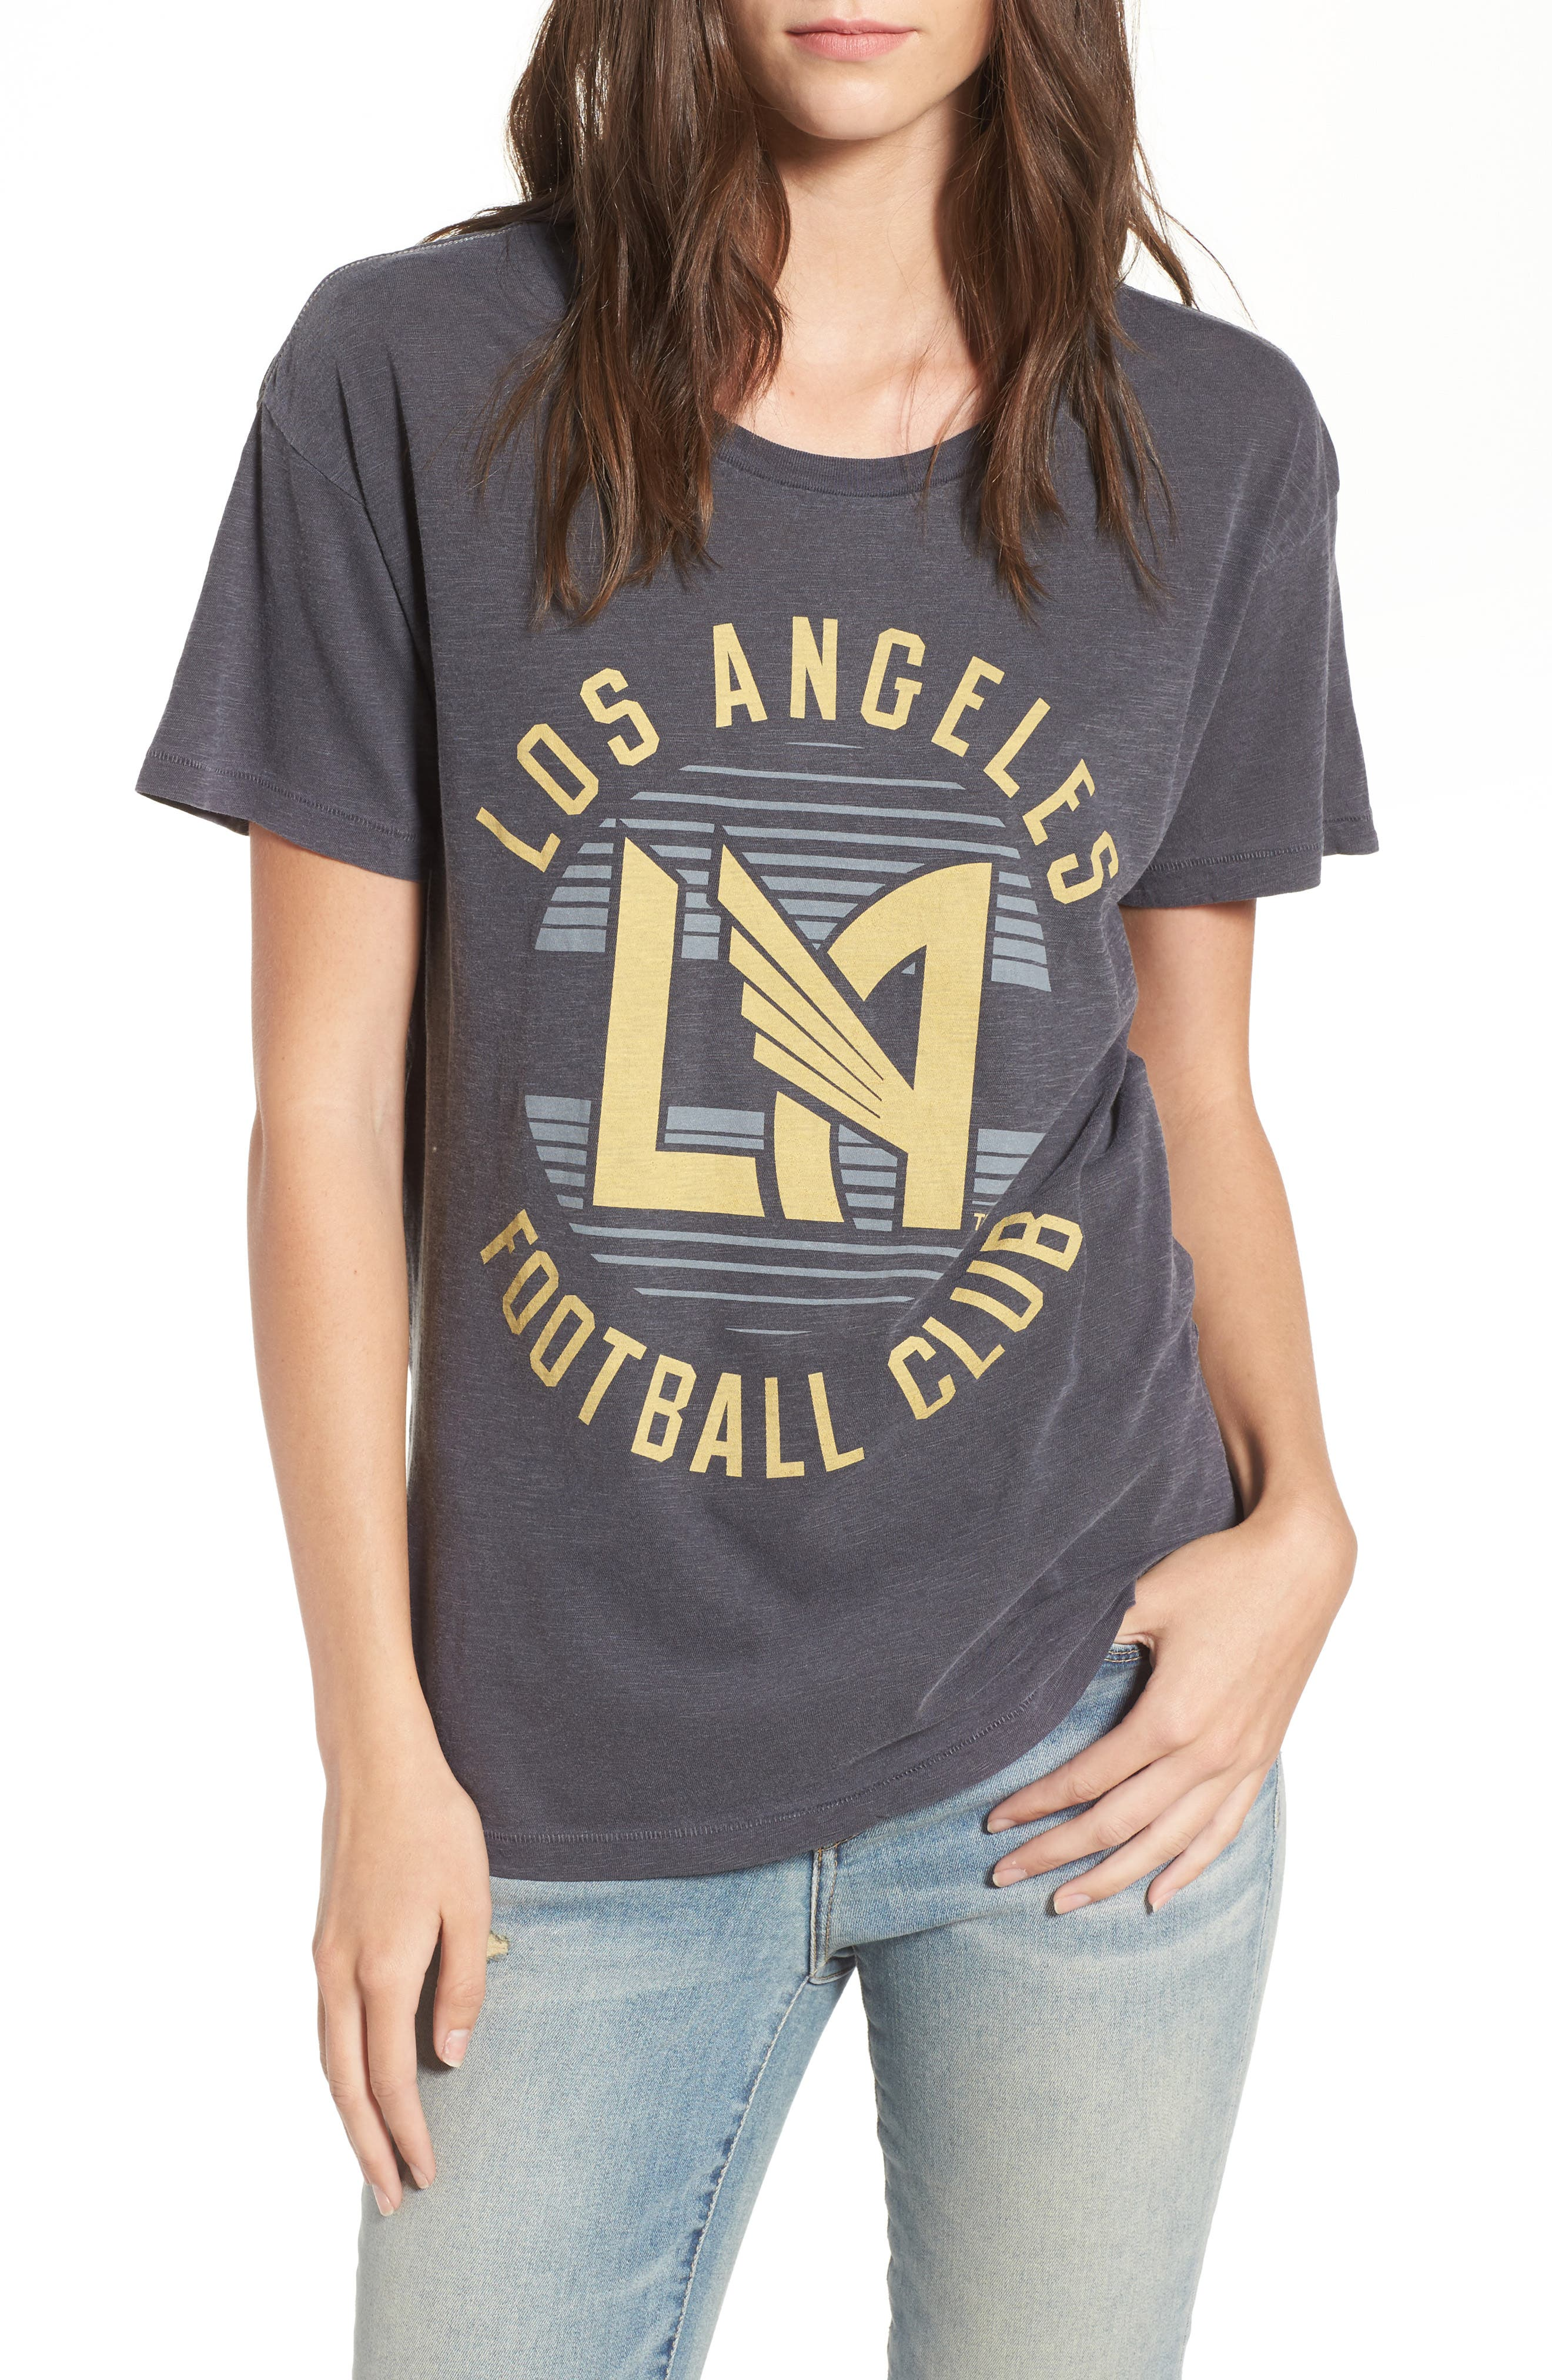 Los Angeles FC Boyfriend Tee,                             Main thumbnail 1, color,                             Jet Black